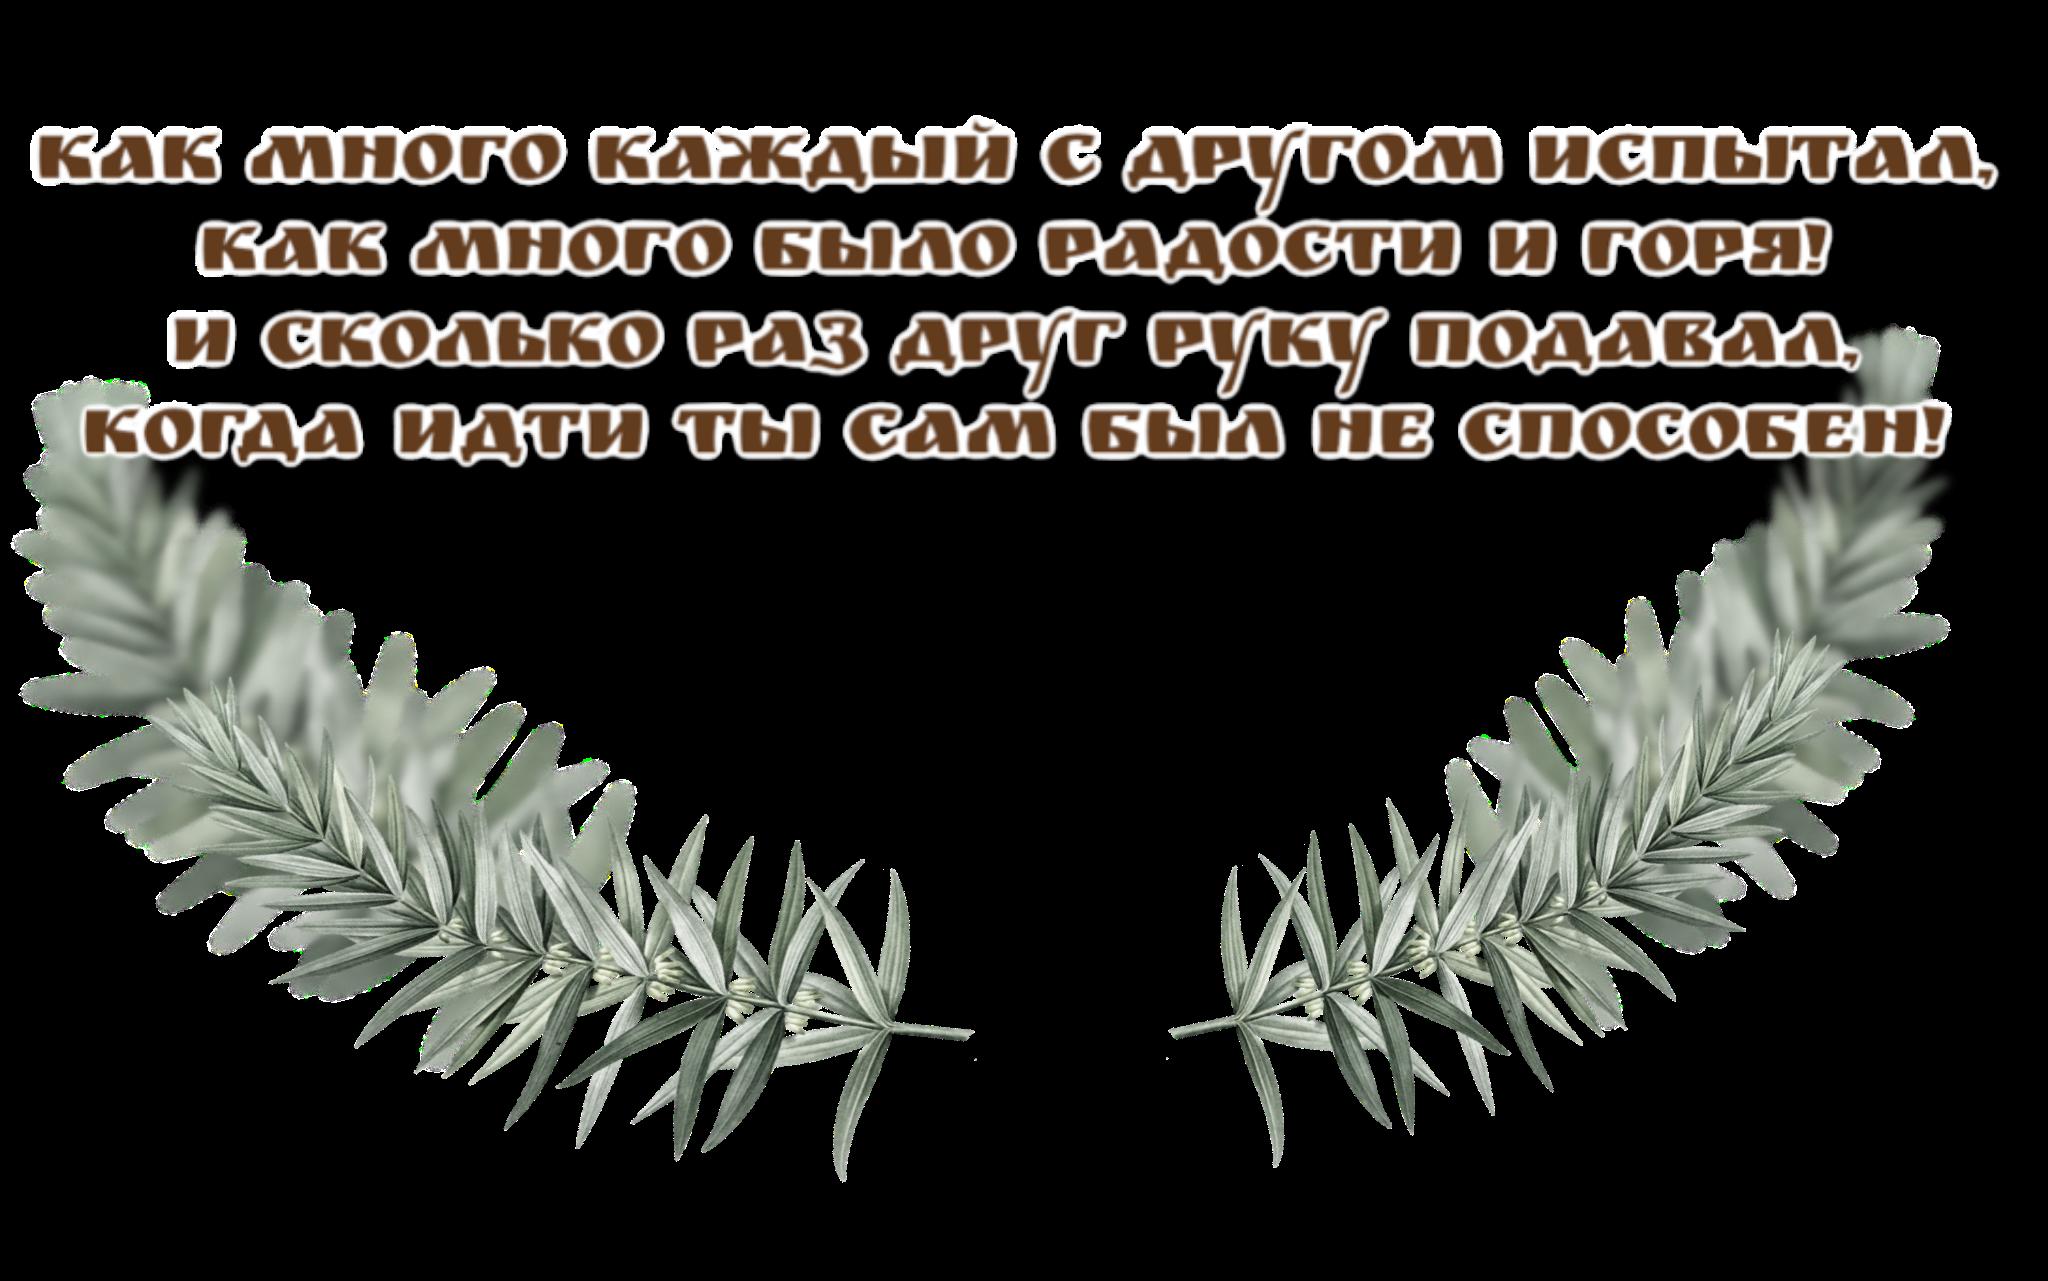 https://i1.imageban.ru/out/2019/12/23/119b8e21adaf99f4ac7e5047e8942780.png